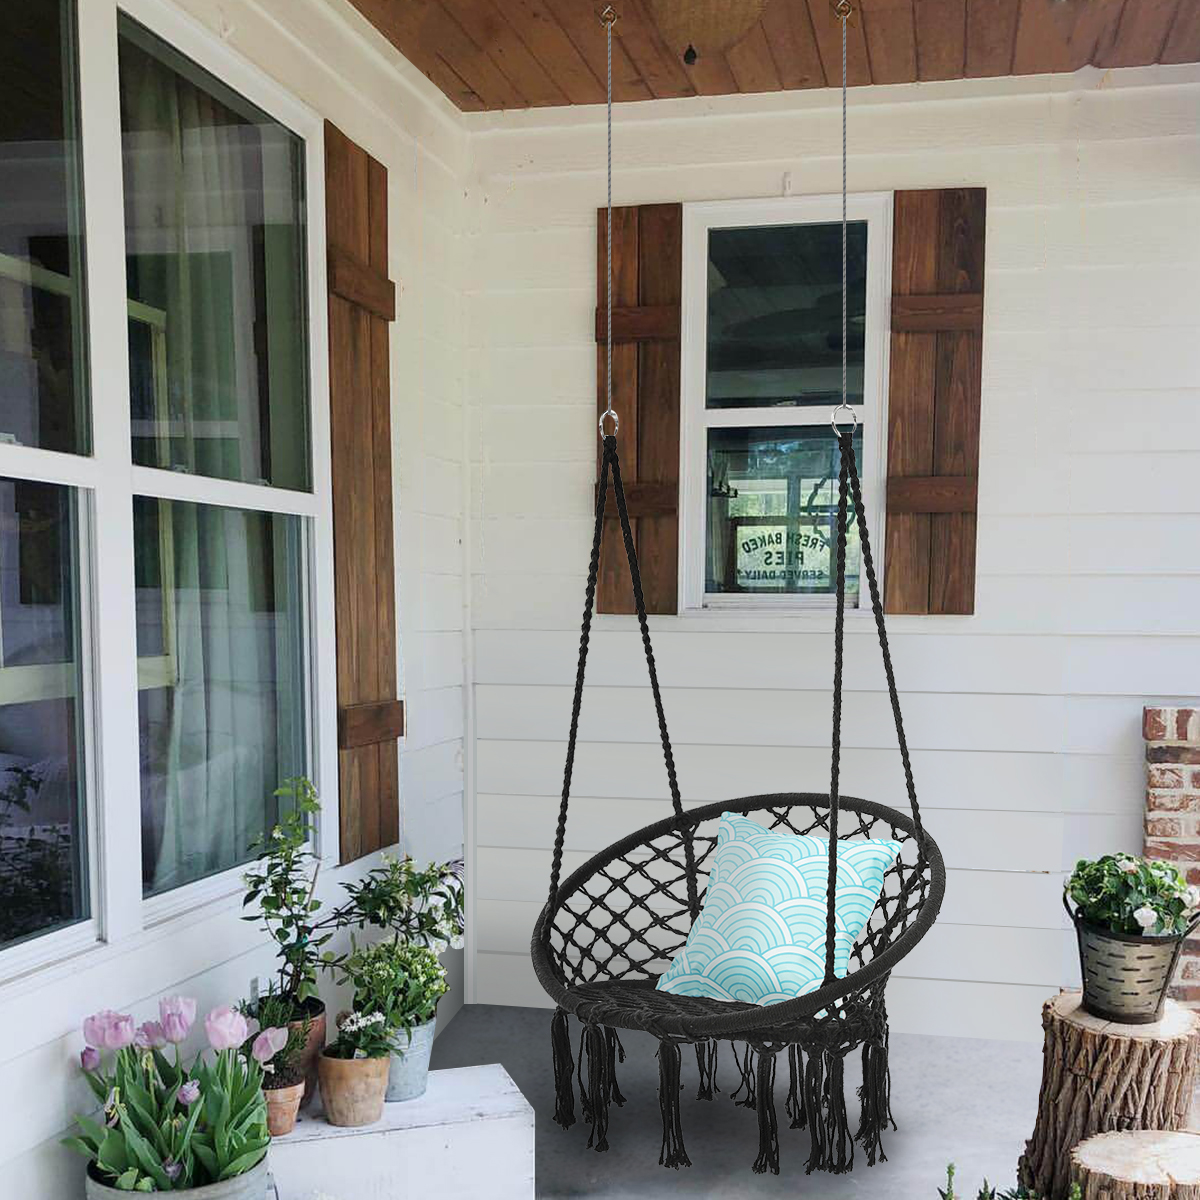 Hammock Chair Macrame Swing Handmade Knitted Hanging Cotton Rope Chair For Indoor Outdoor Home Patio Deck Yard Garden Reading Leisure White Black Walmart Com Walmart Com